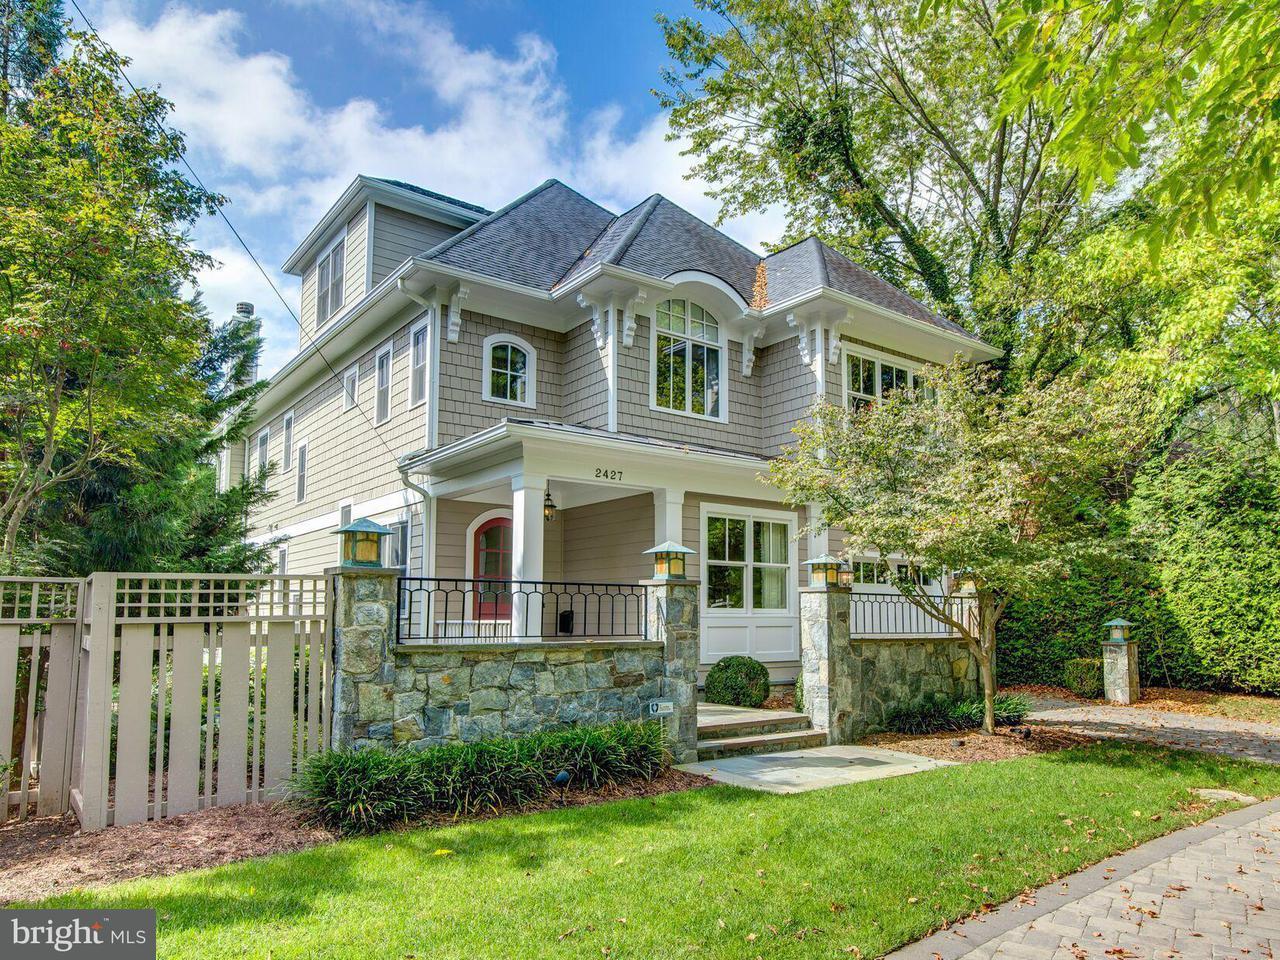 Casa Unifamiliar por un Venta en 2427 CHAIN BRIDGE RD NW 2427 CHAIN BRIDGE RD NW Washington, Distrito De Columbia 20016 Estados Unidos